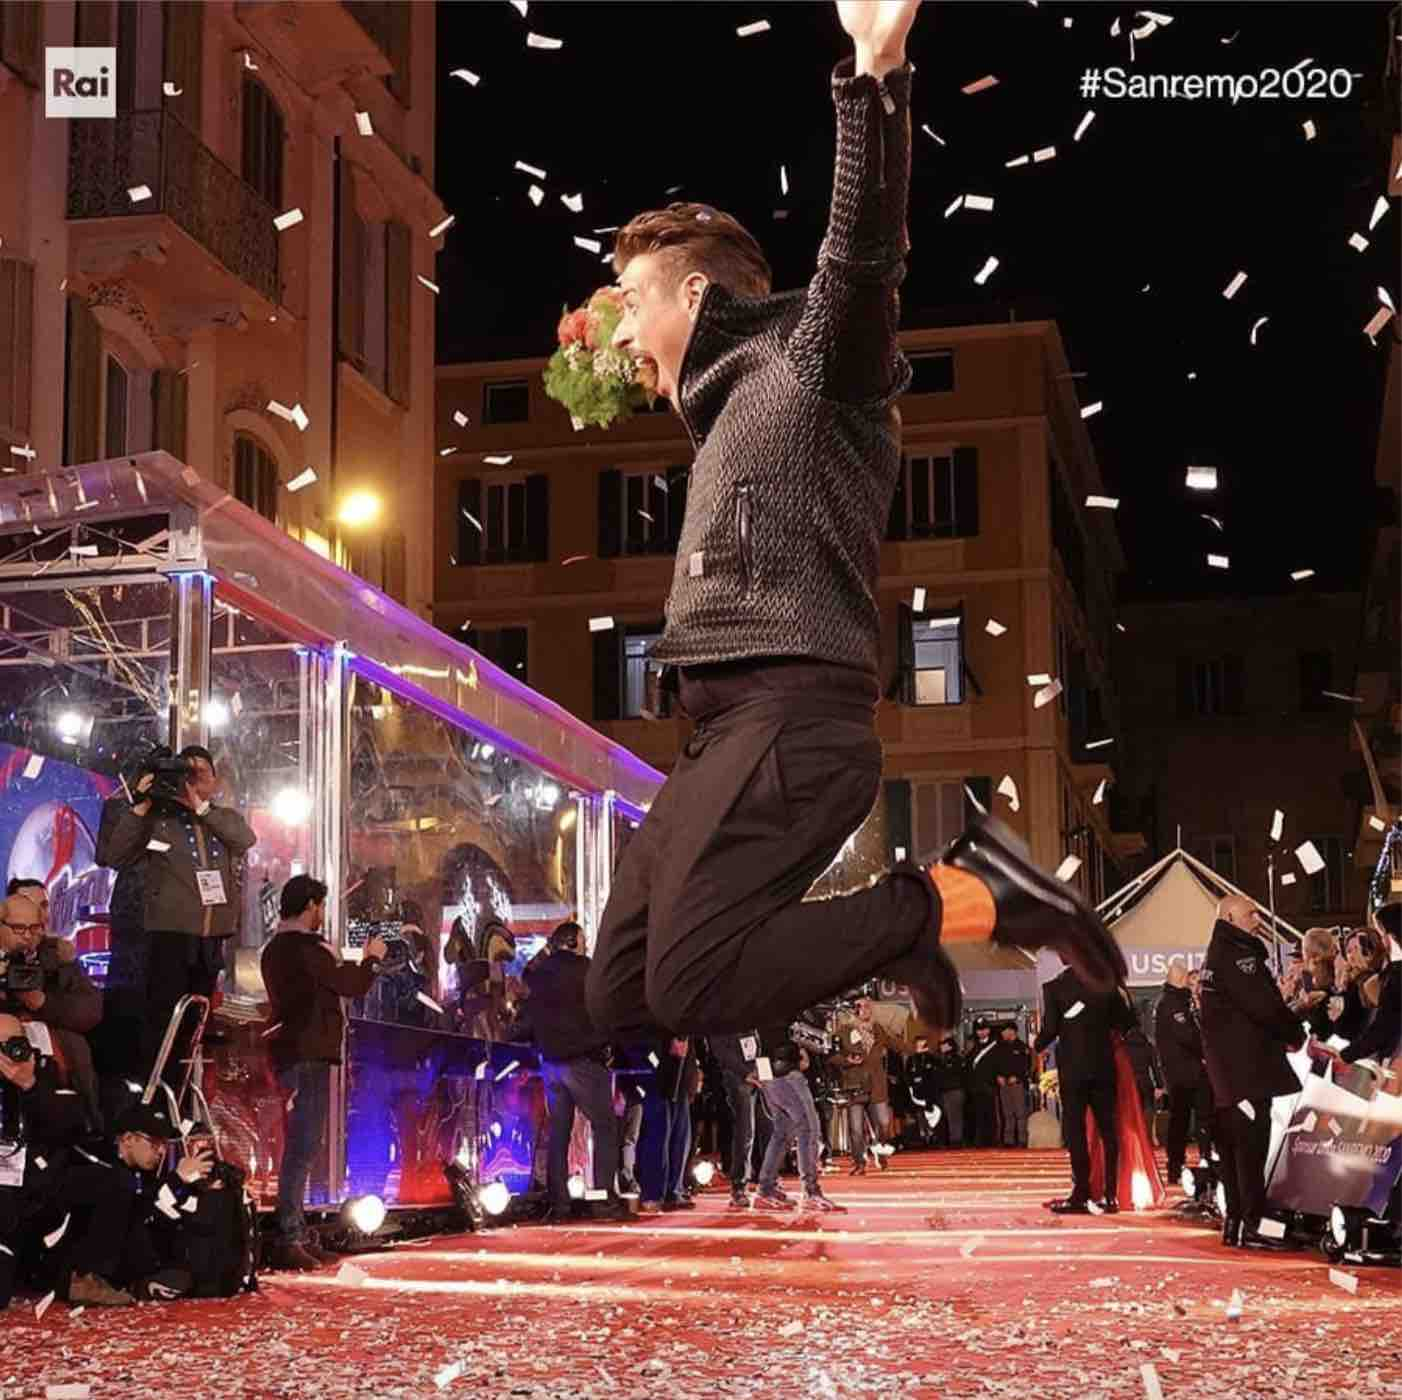 Francesco Gabbani Sanremo 2020